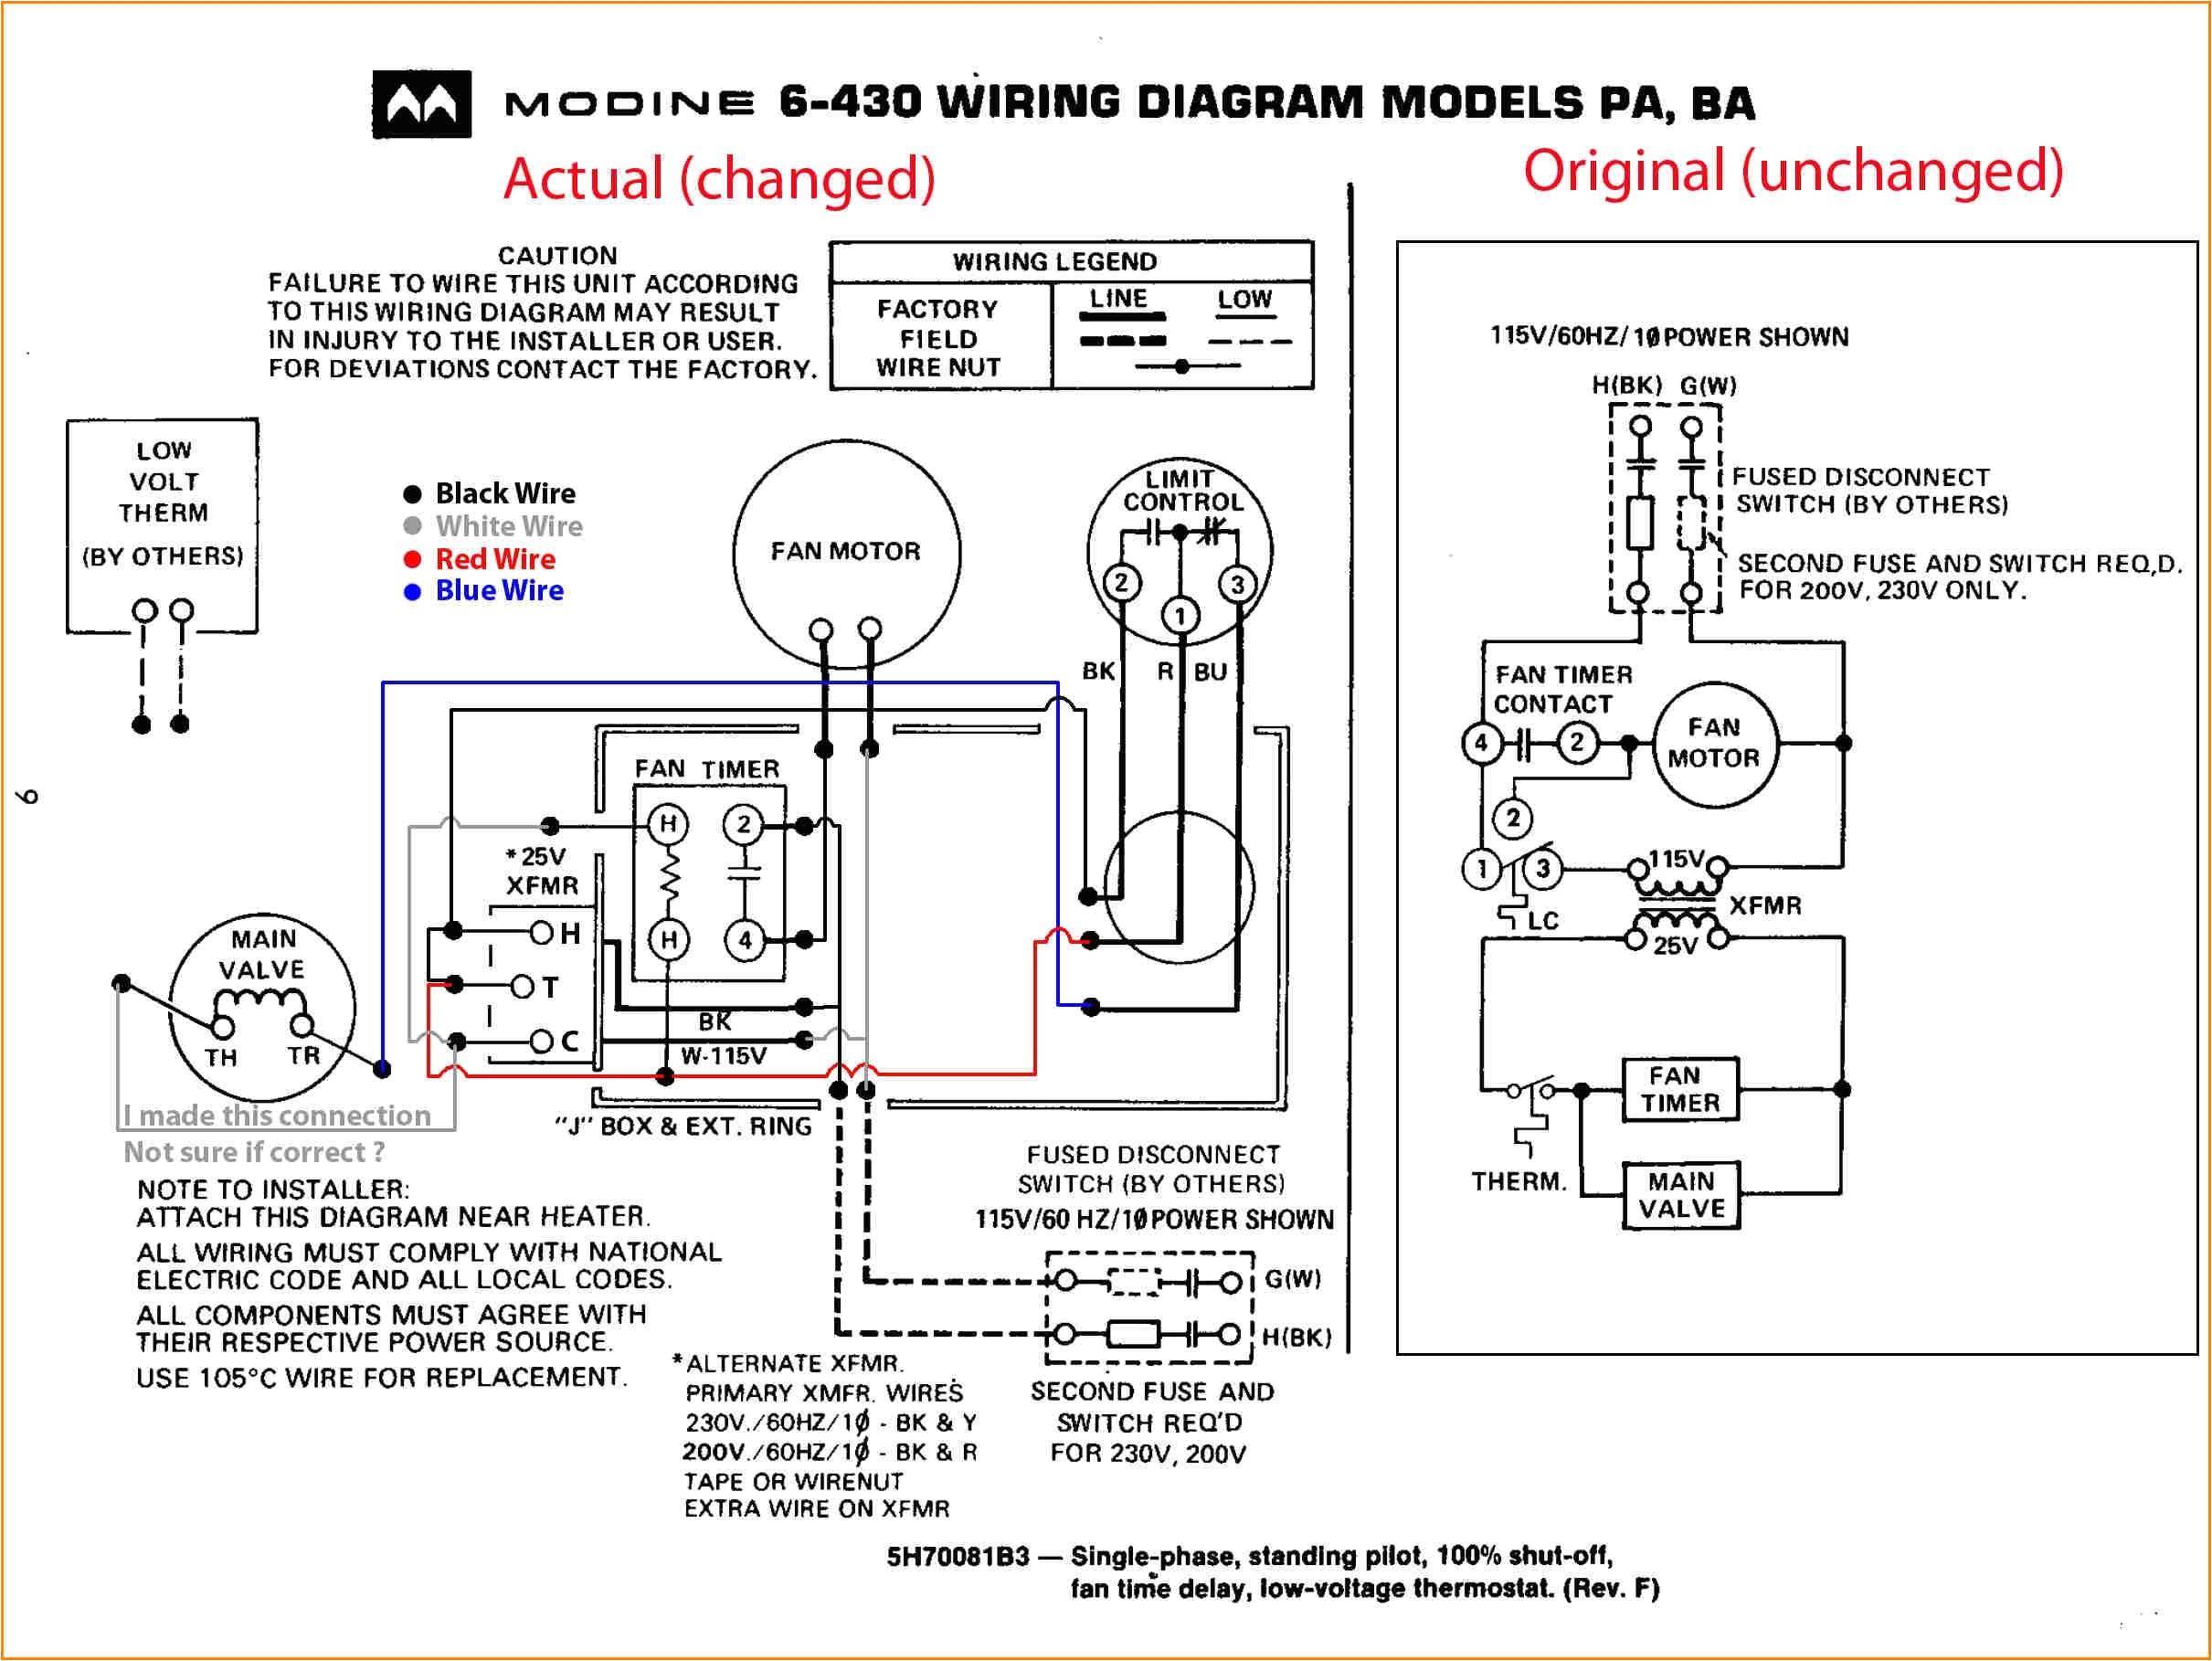 janitrol hvac fan motor wiring diagram wiring diagram blog goodman hvac fan wiring diagram wiring diagram